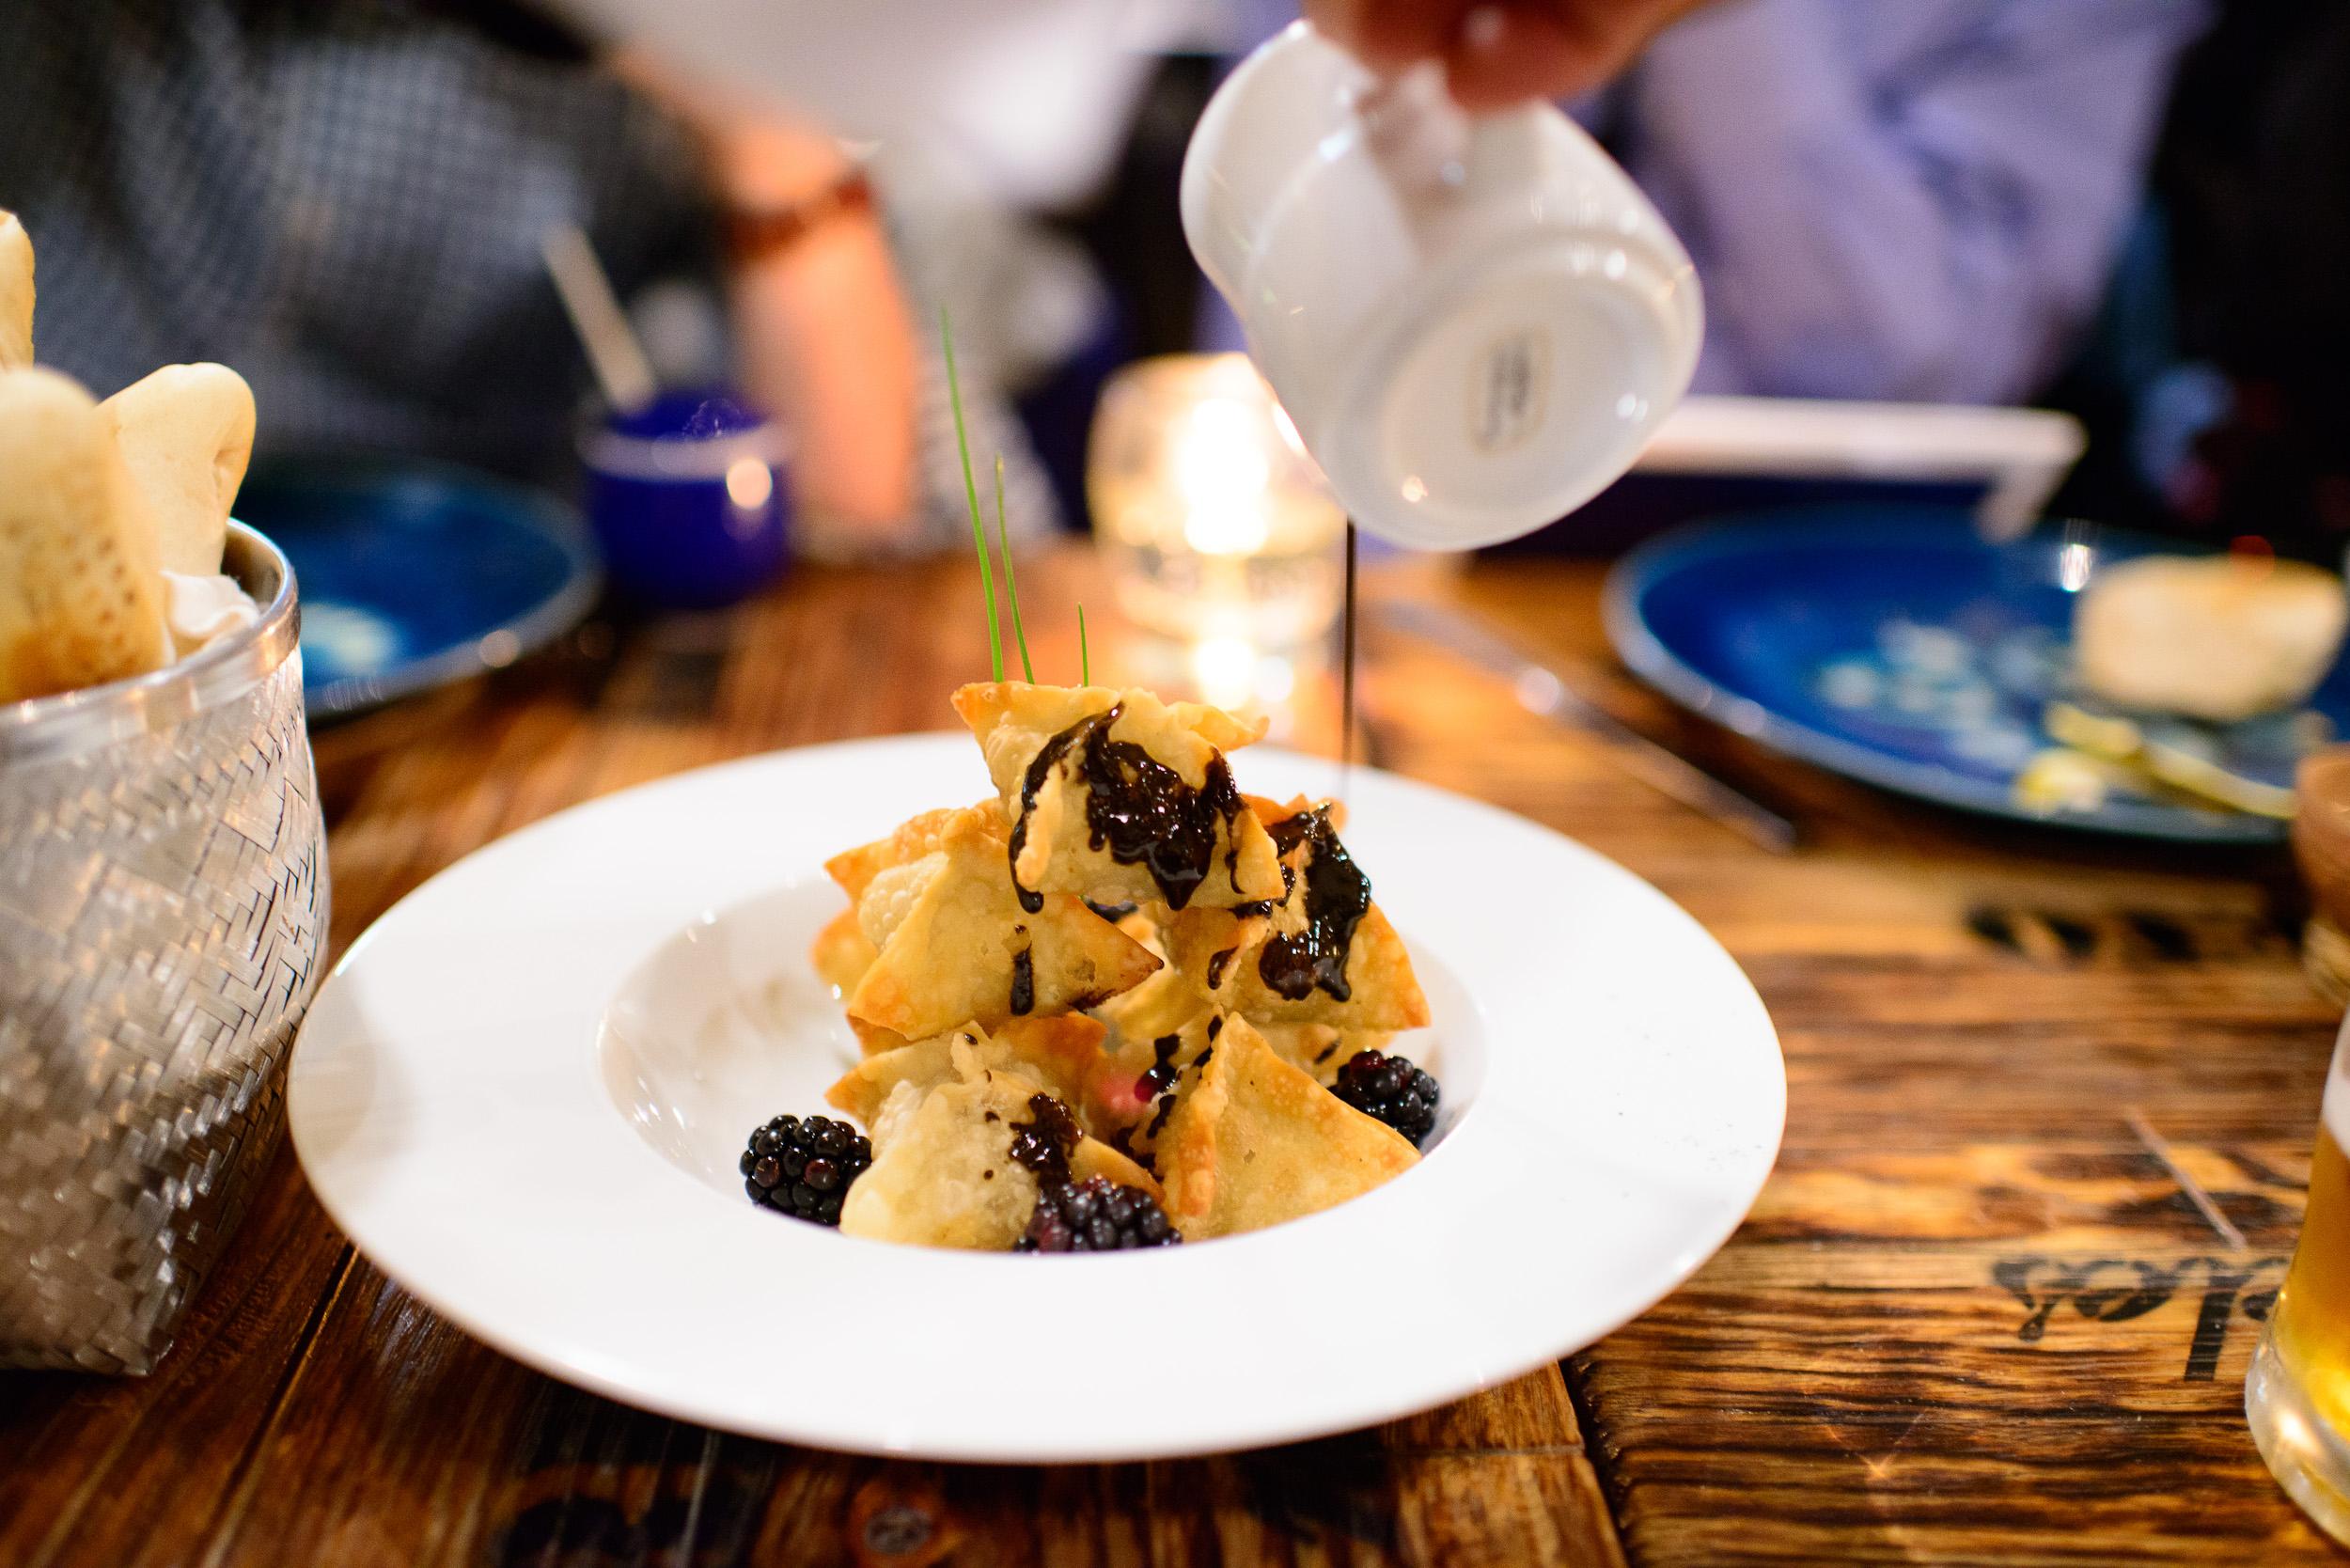 Buñuelos rellenos de pato rostizado, bañados con salsa de mole